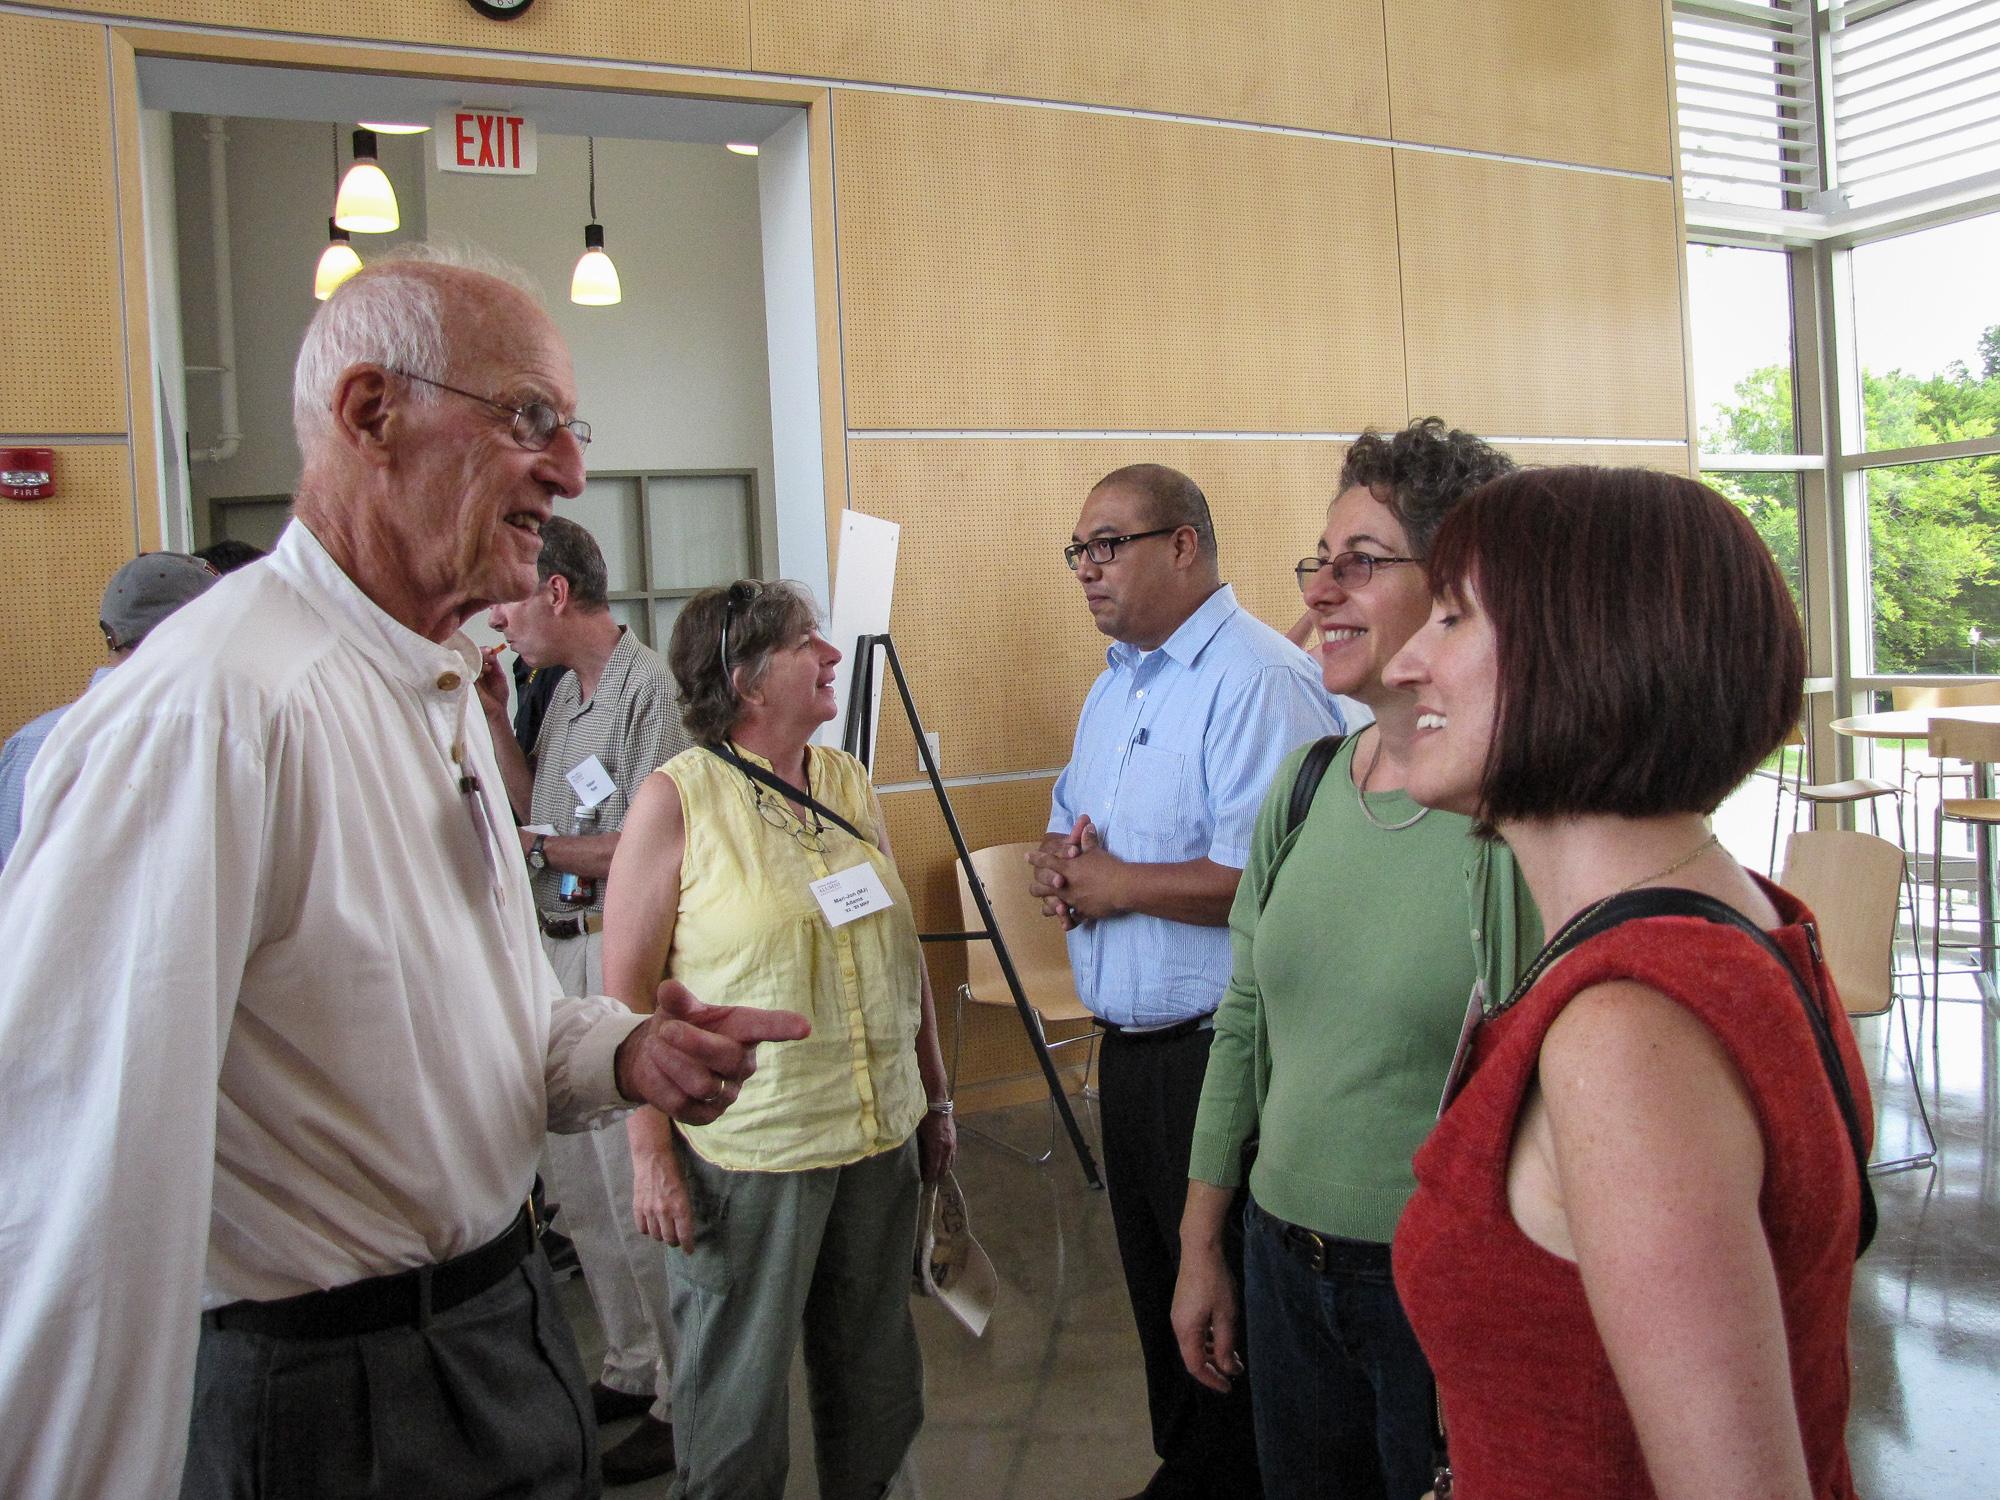 Former Congressman John Olver shared his ideas